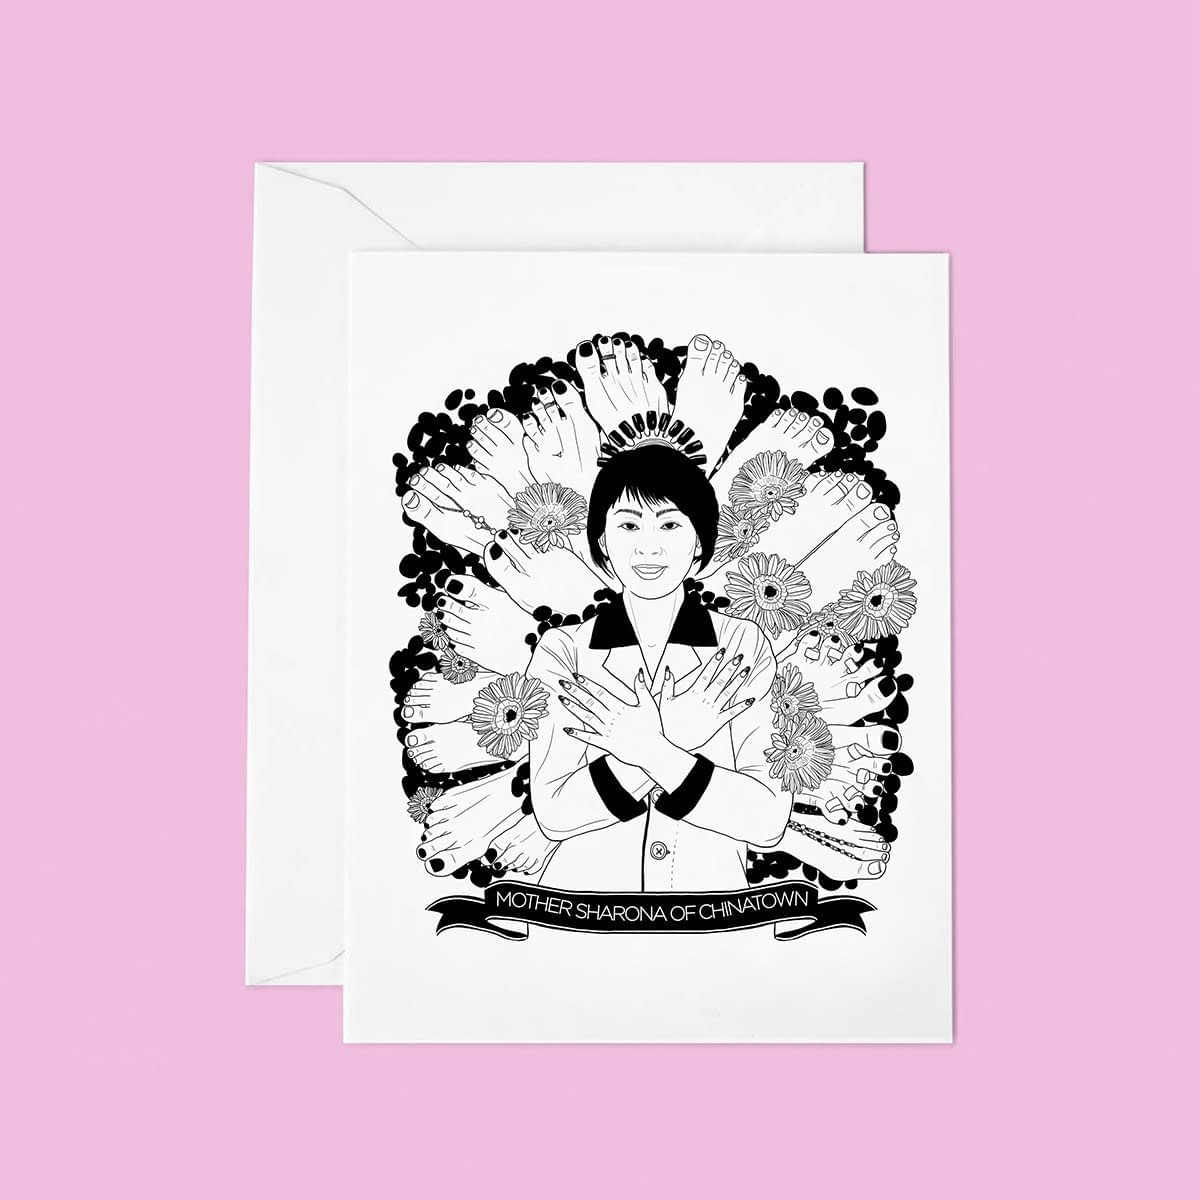 TUTTISANTI | Mother Sharona of Chinatown